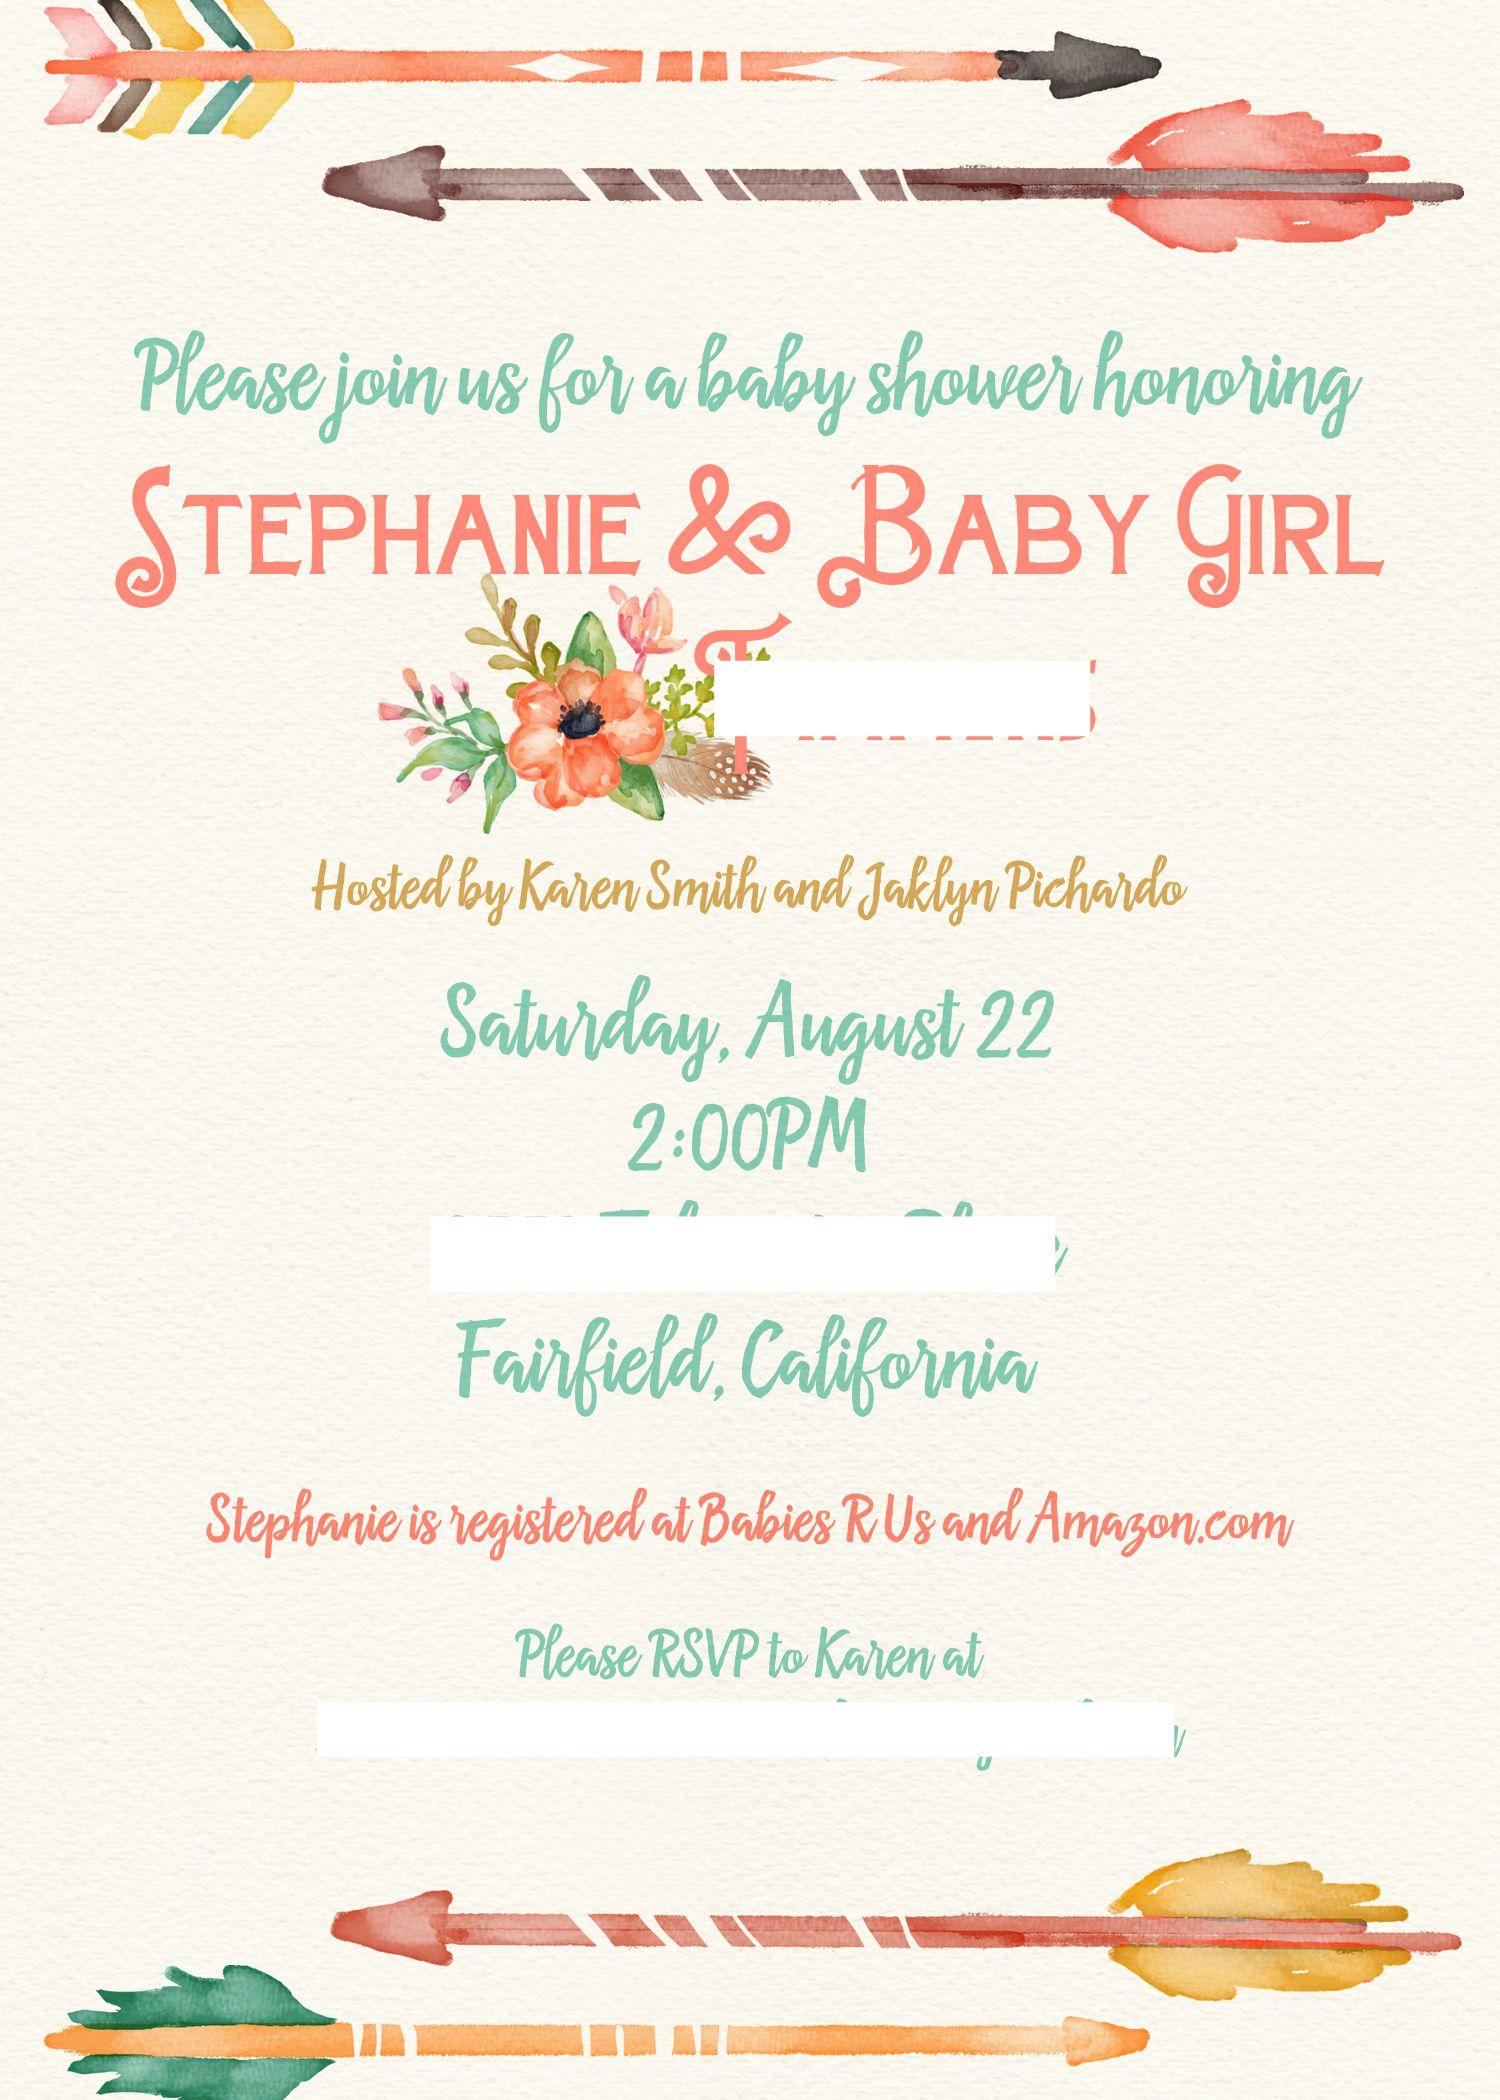 Steph's Baby Shower InviteEDITED.jpg